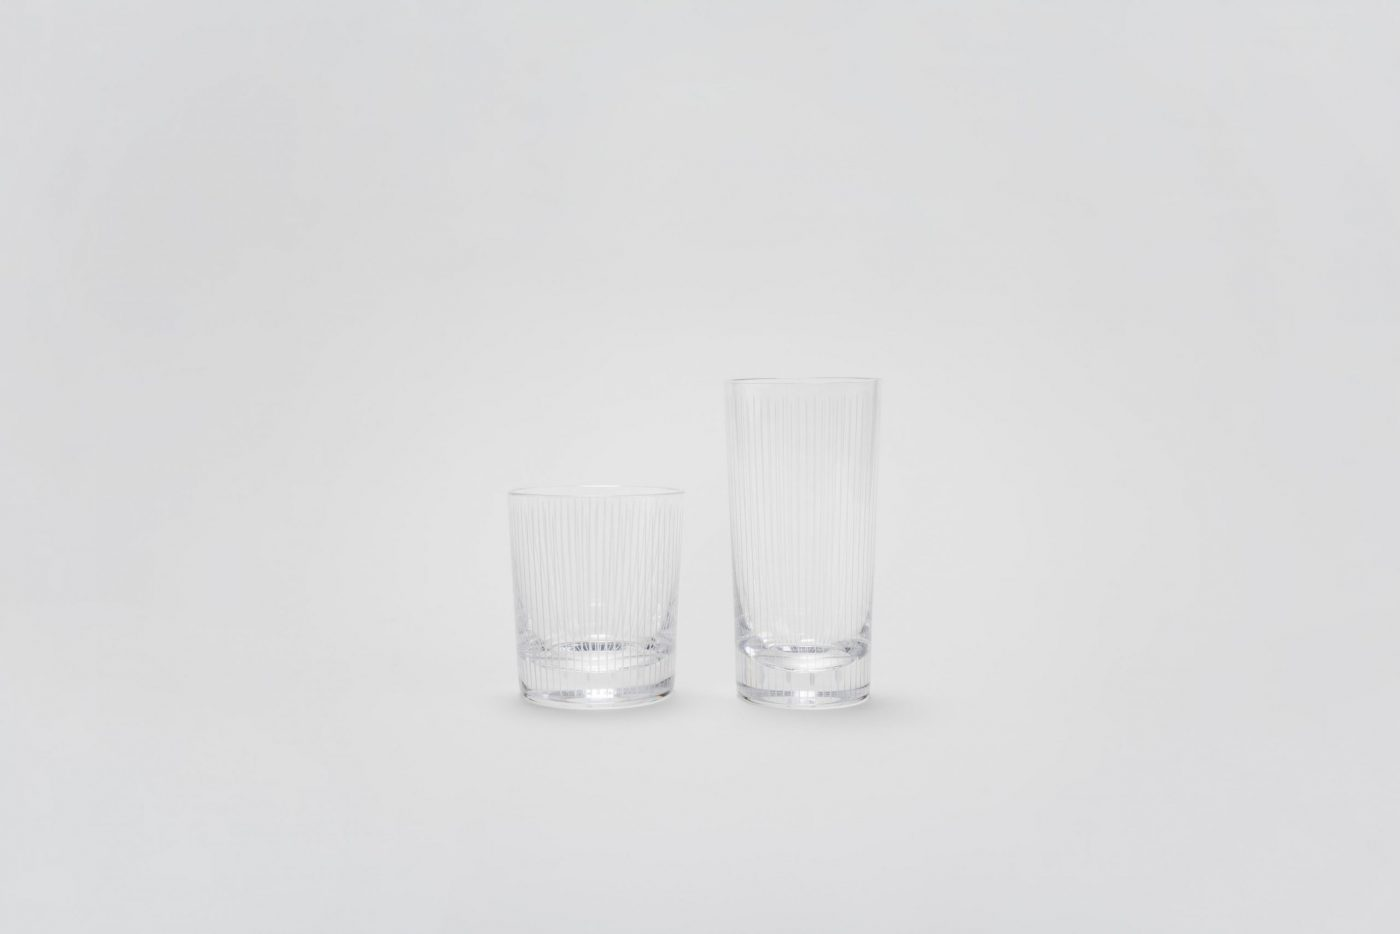 02 MYKILOS RAY GLASS TUMBLER HIGHBALL CRYSTAL scaled